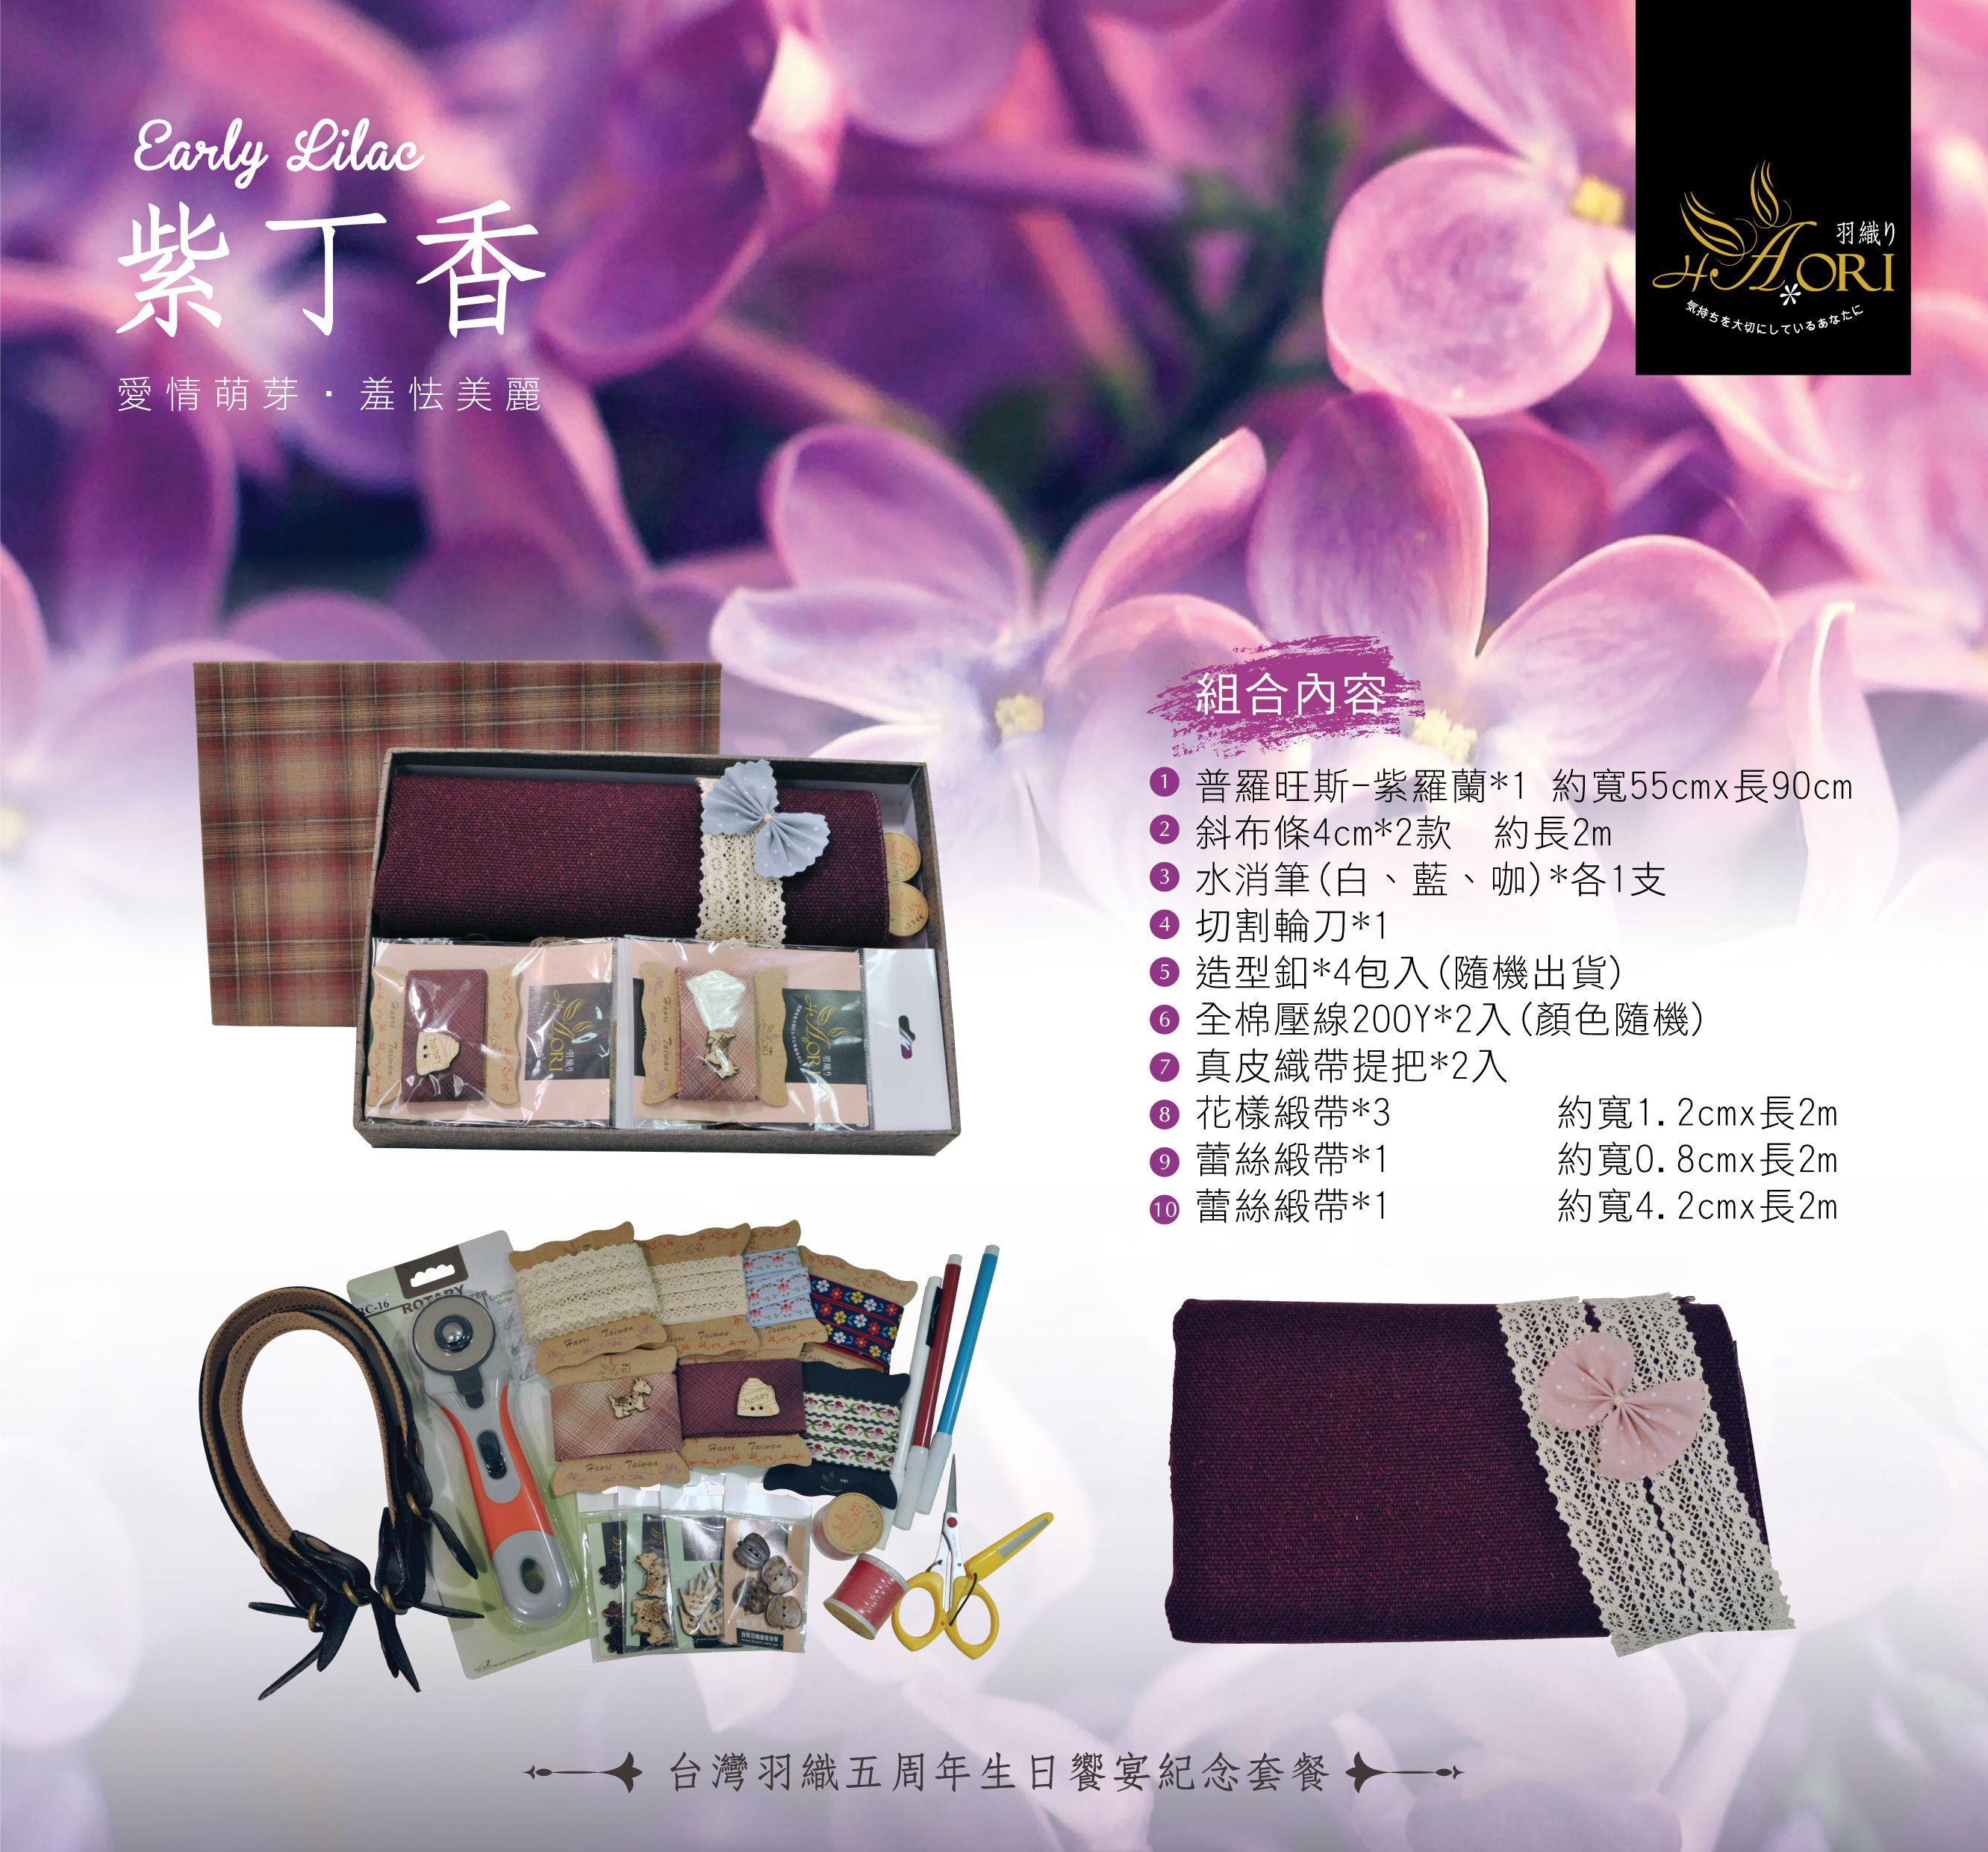 precut fabric with kit 5